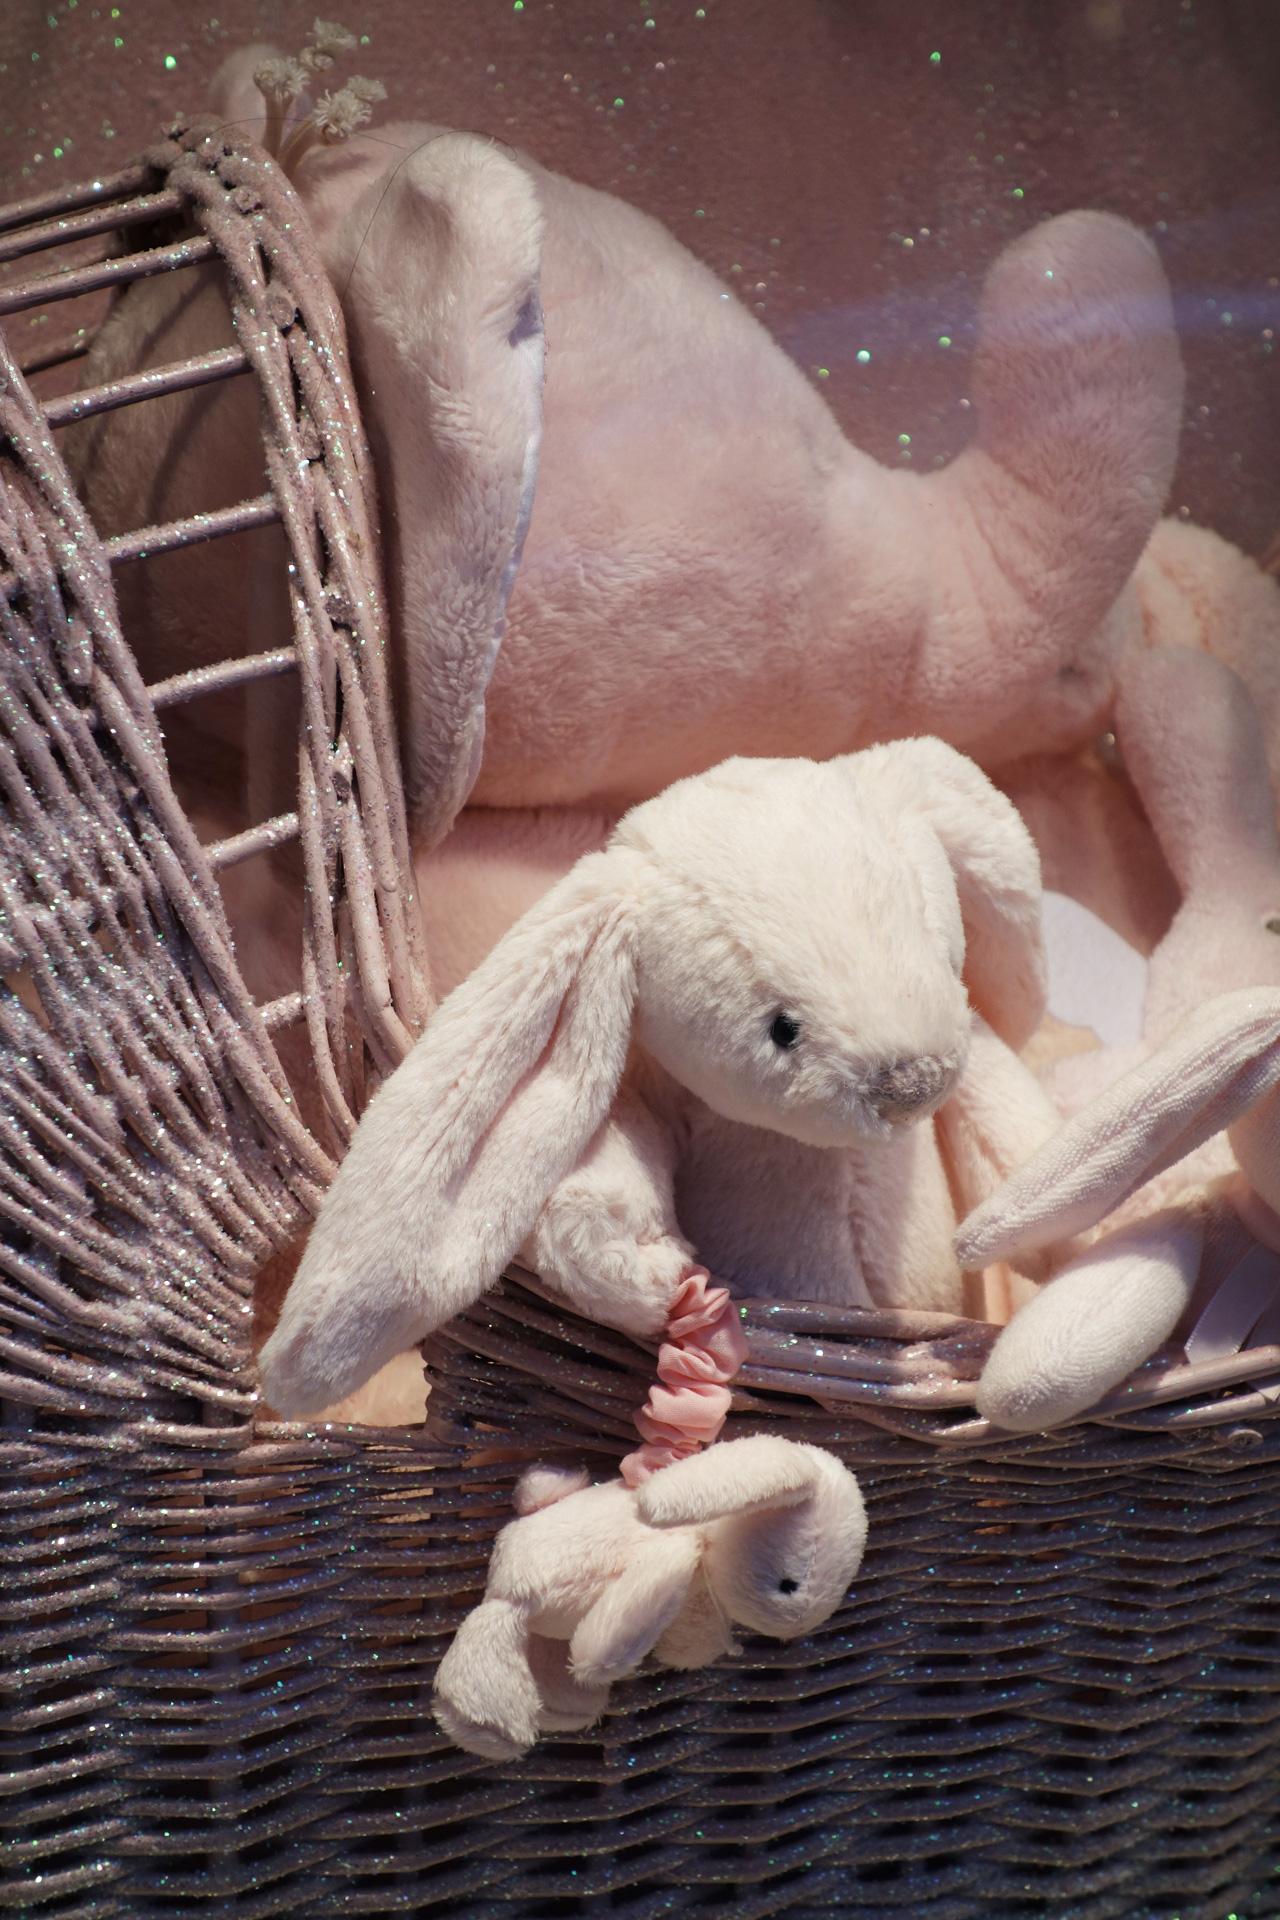 Baby-Tuileries-vitrines-noel-2013-rose-lapin-mini